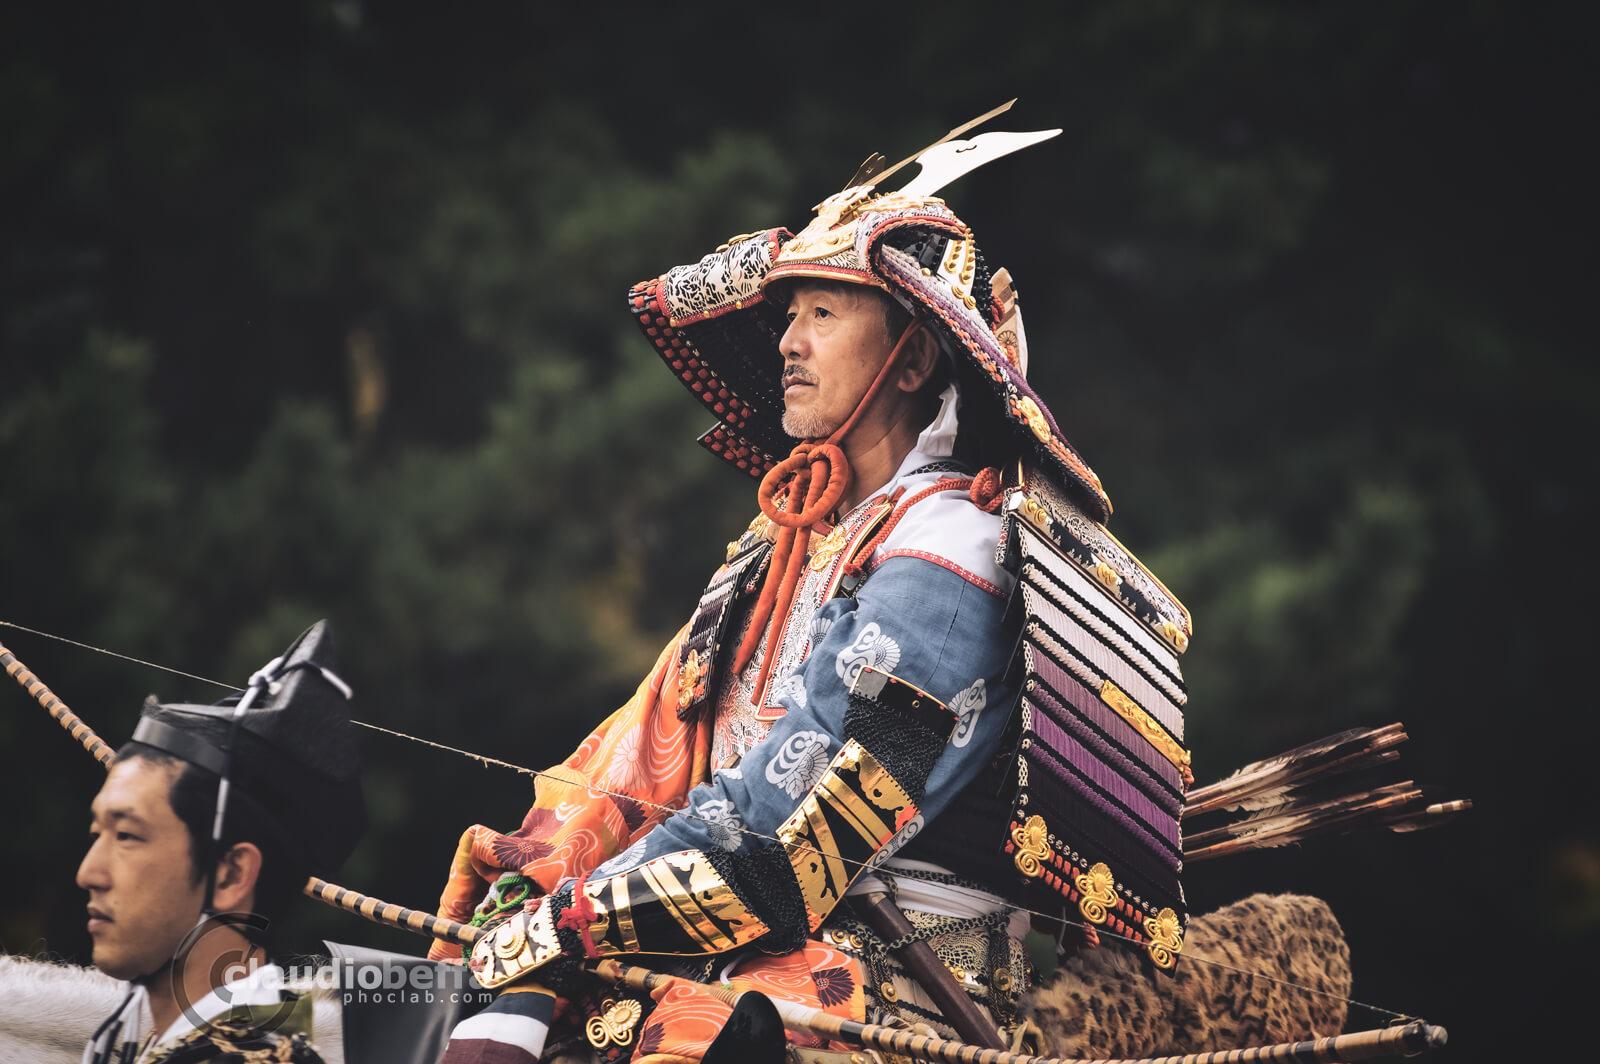 Kusunoki Masashige legendary samurai. Yoroi, Armor, Kabuto, Helmet, Yumi, Longbow, Jidai Matsuri, Festival, Kyoto, Japan, History, Tradition, Travel.